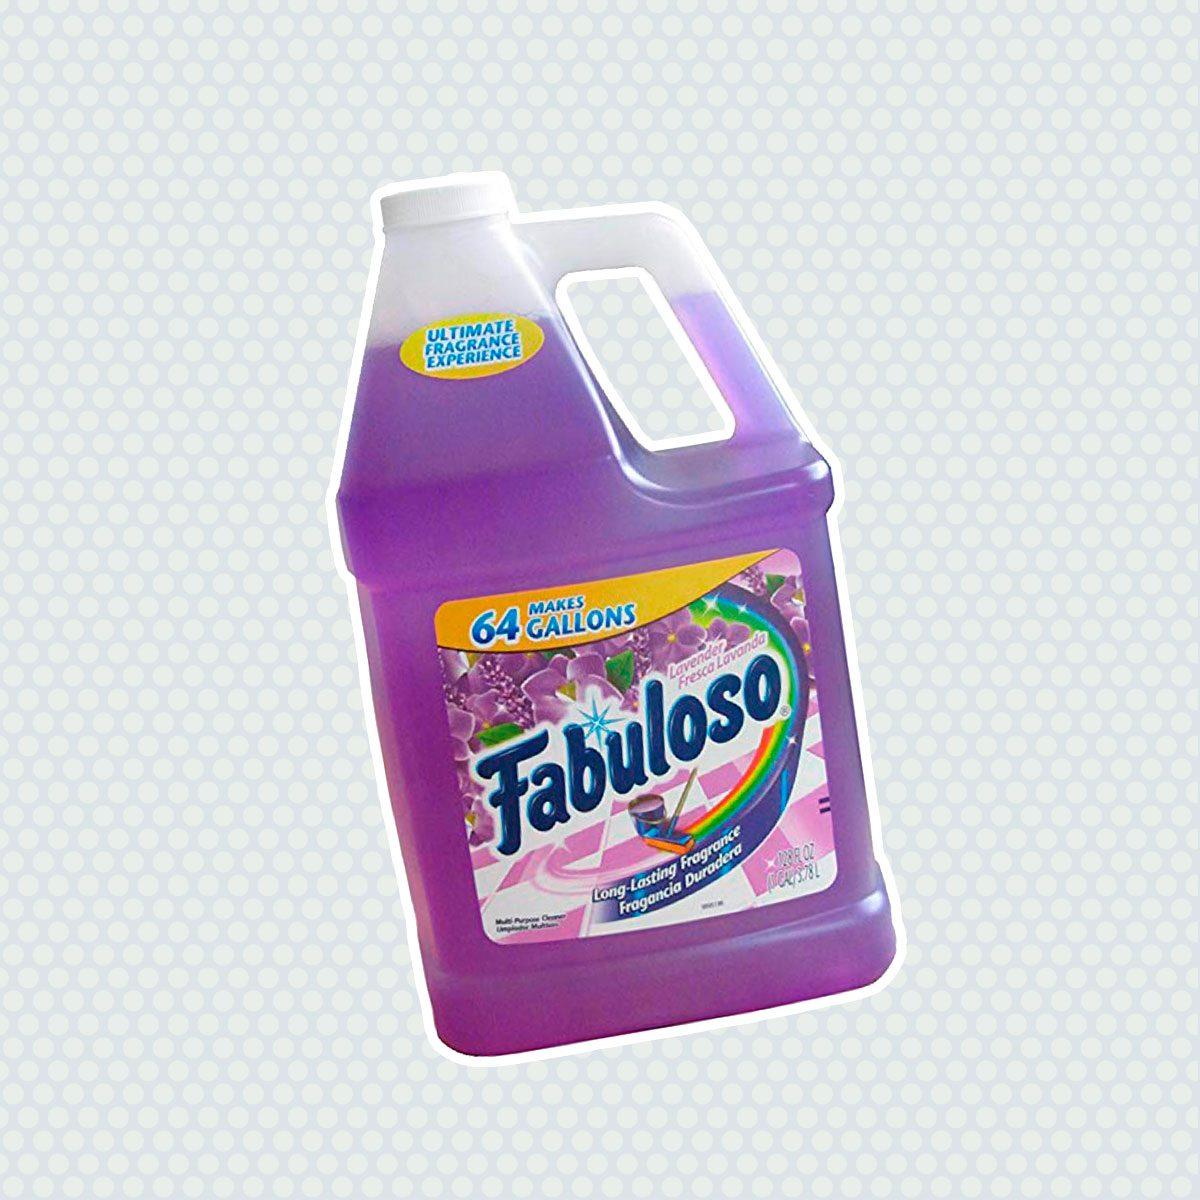 Fabuloso 4307 Long Lasting Fragrance, Lavender